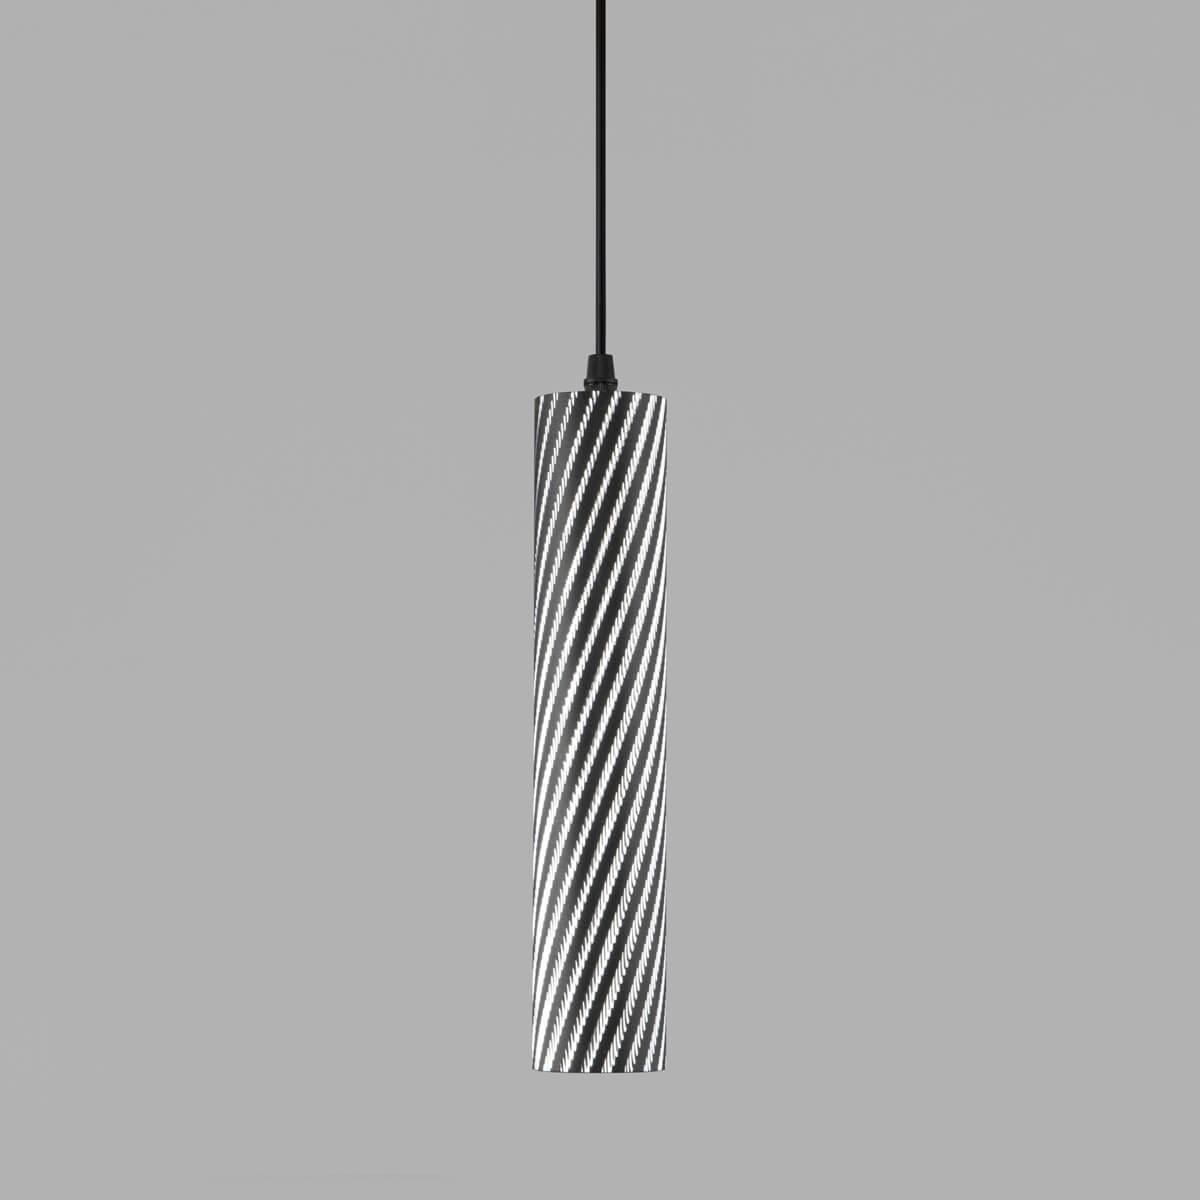 Светильник Eurosvet 50190/1 LED черный Boston susan kelly boston stranglers